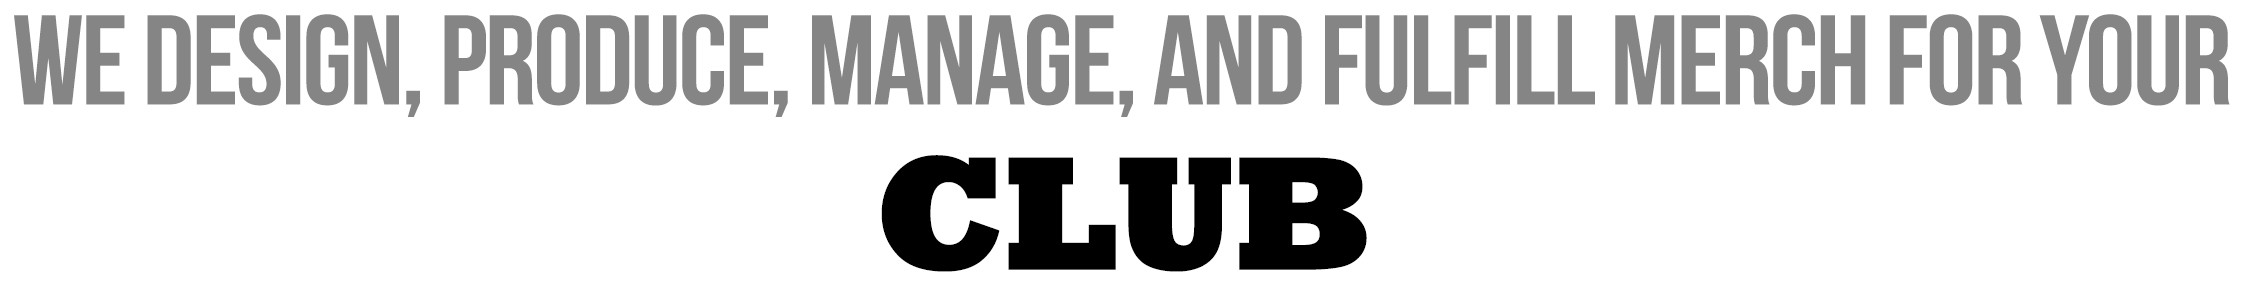 ocd-club.jpg